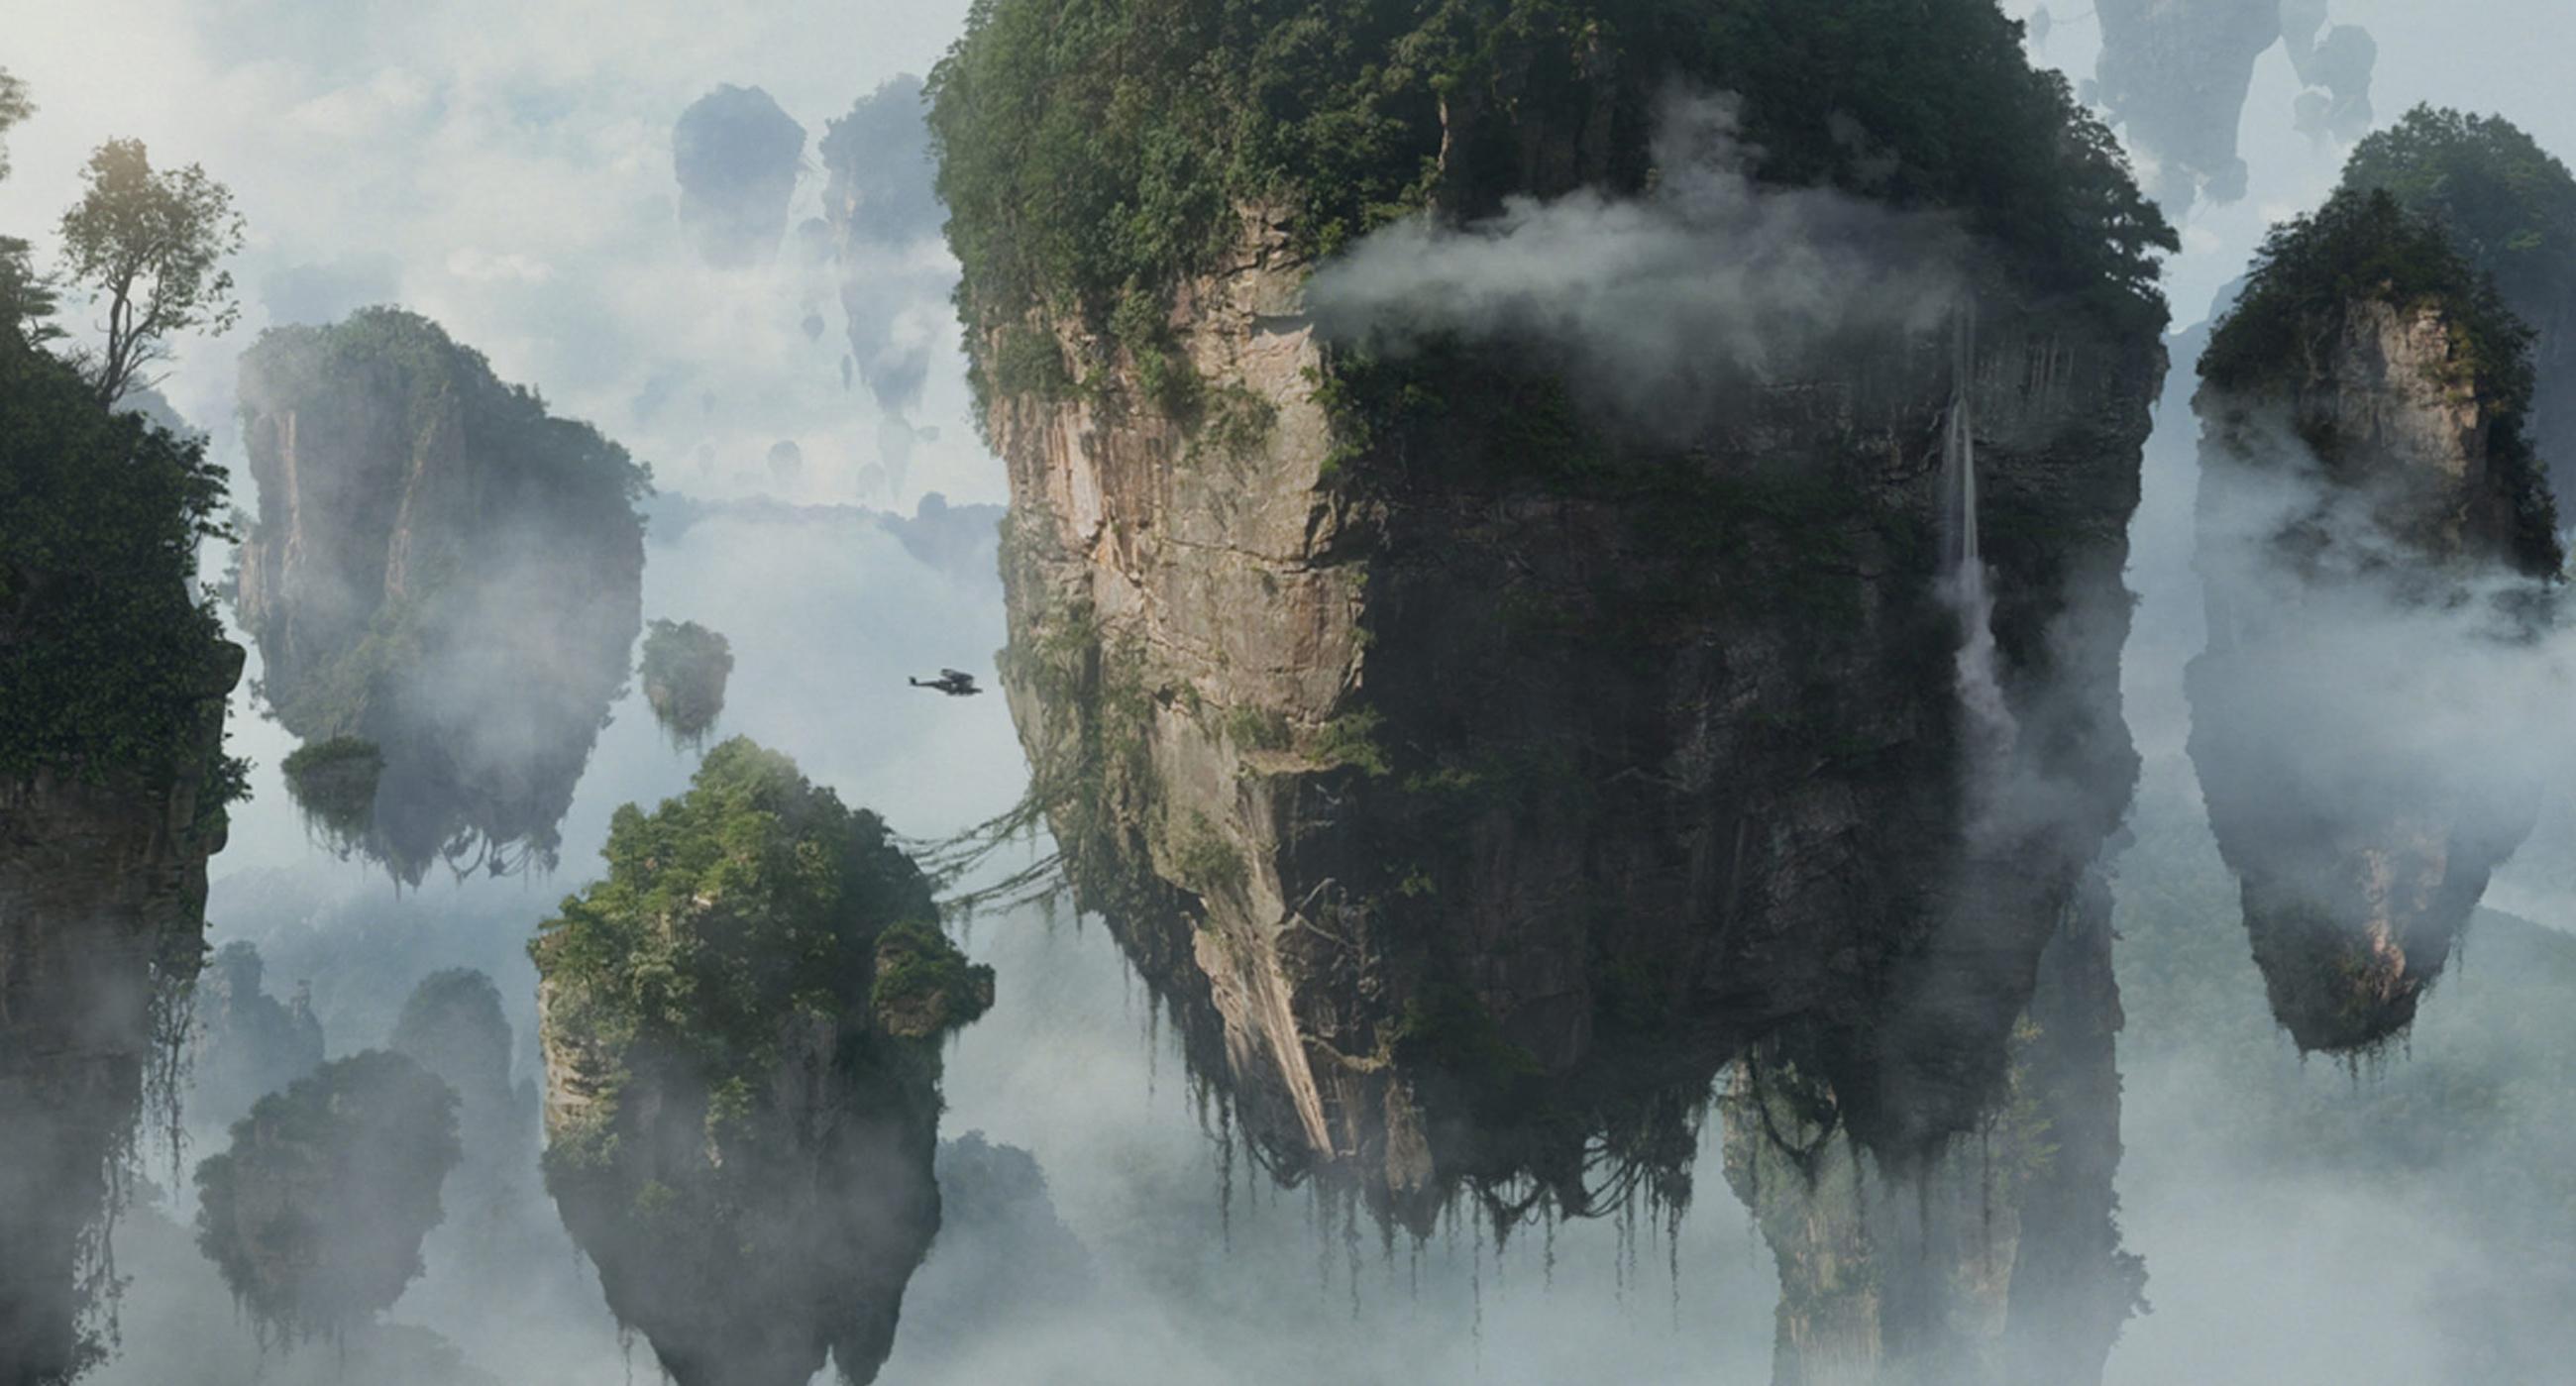 Scene from 'Avatar'